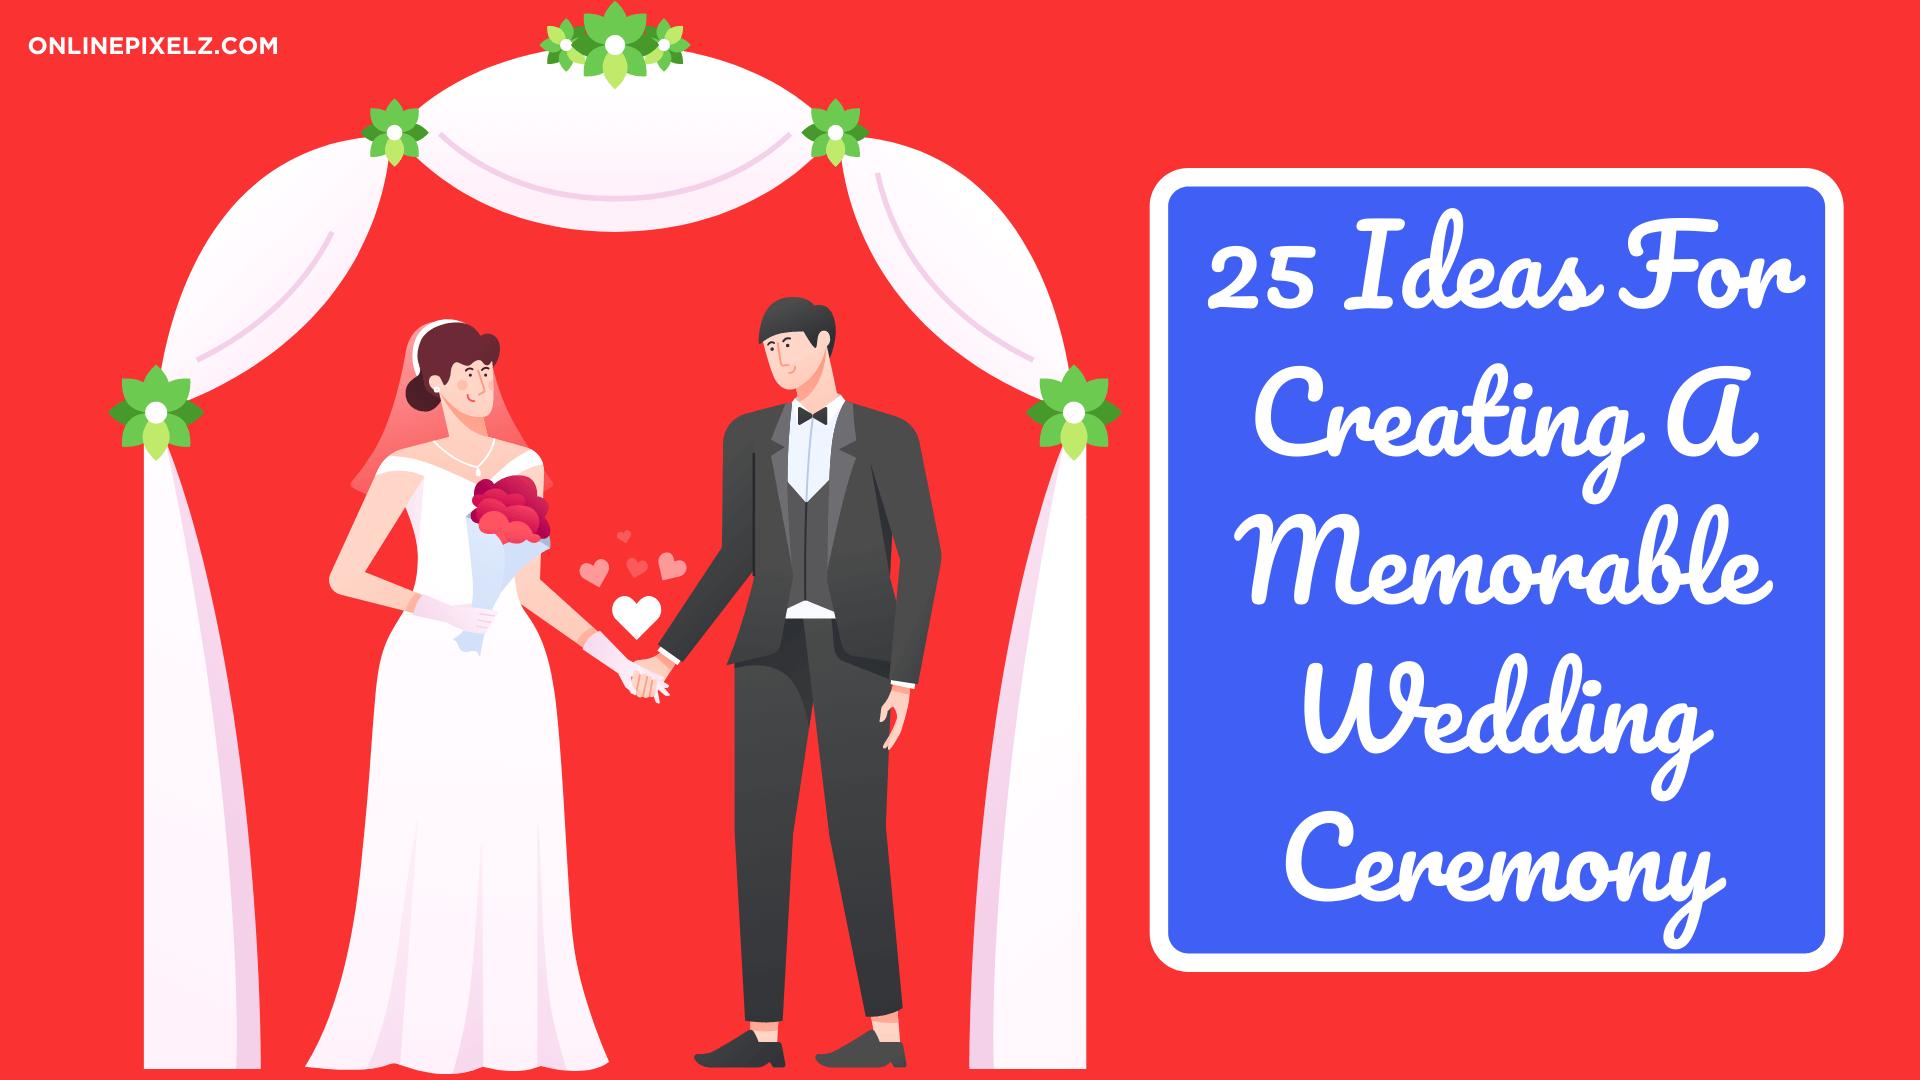 Ideas for Creating Memorable Wedding Ceremony